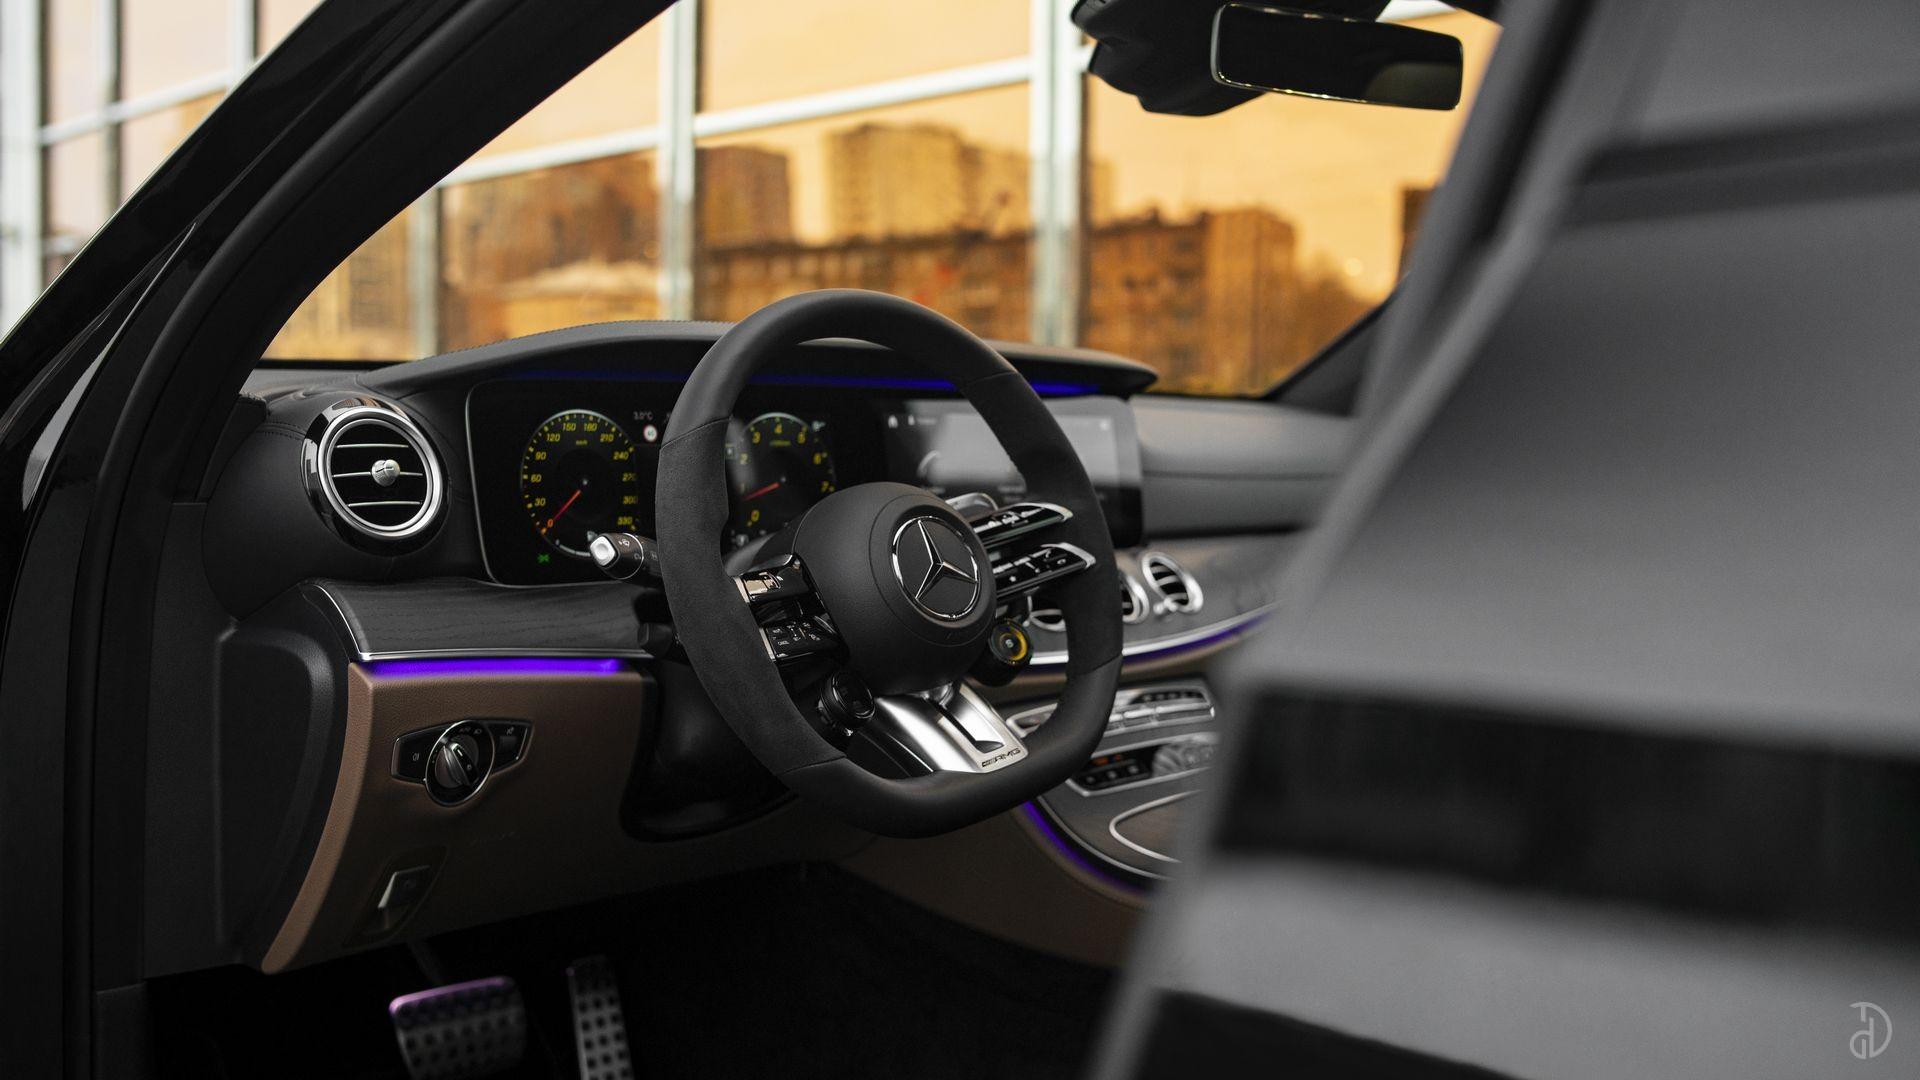 Аренда Mercedes Benz E 63 Amg S 2020 в Москве. Фото 16